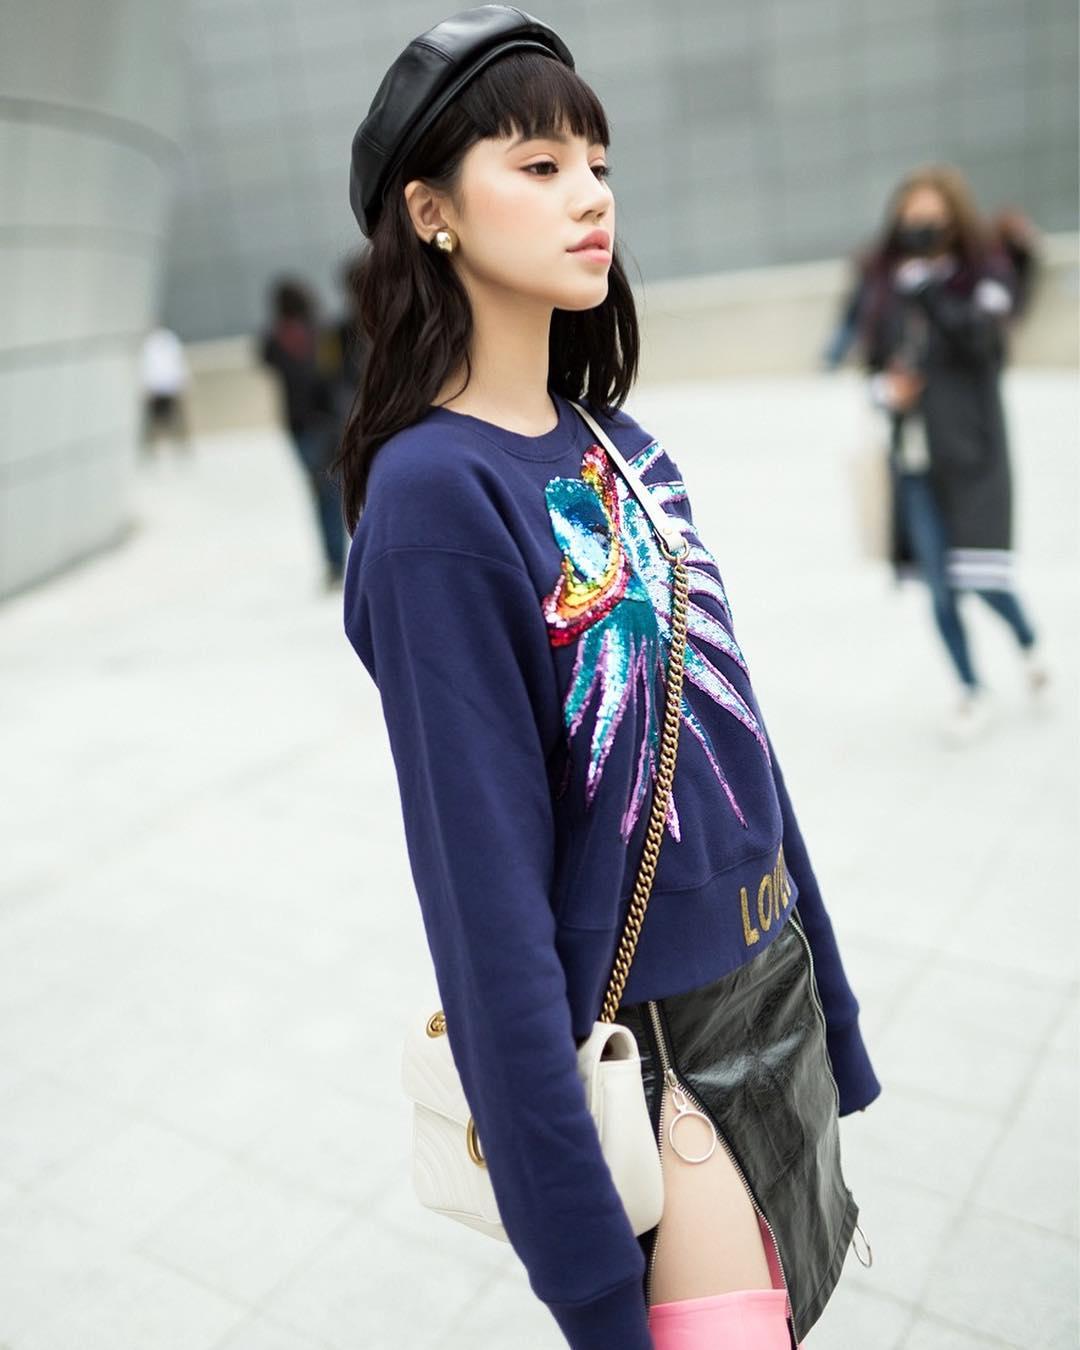 jolie-hoa-tiet-ngam-nghia-street-style-cua-sao-viet-tai-seoul-fashion-week